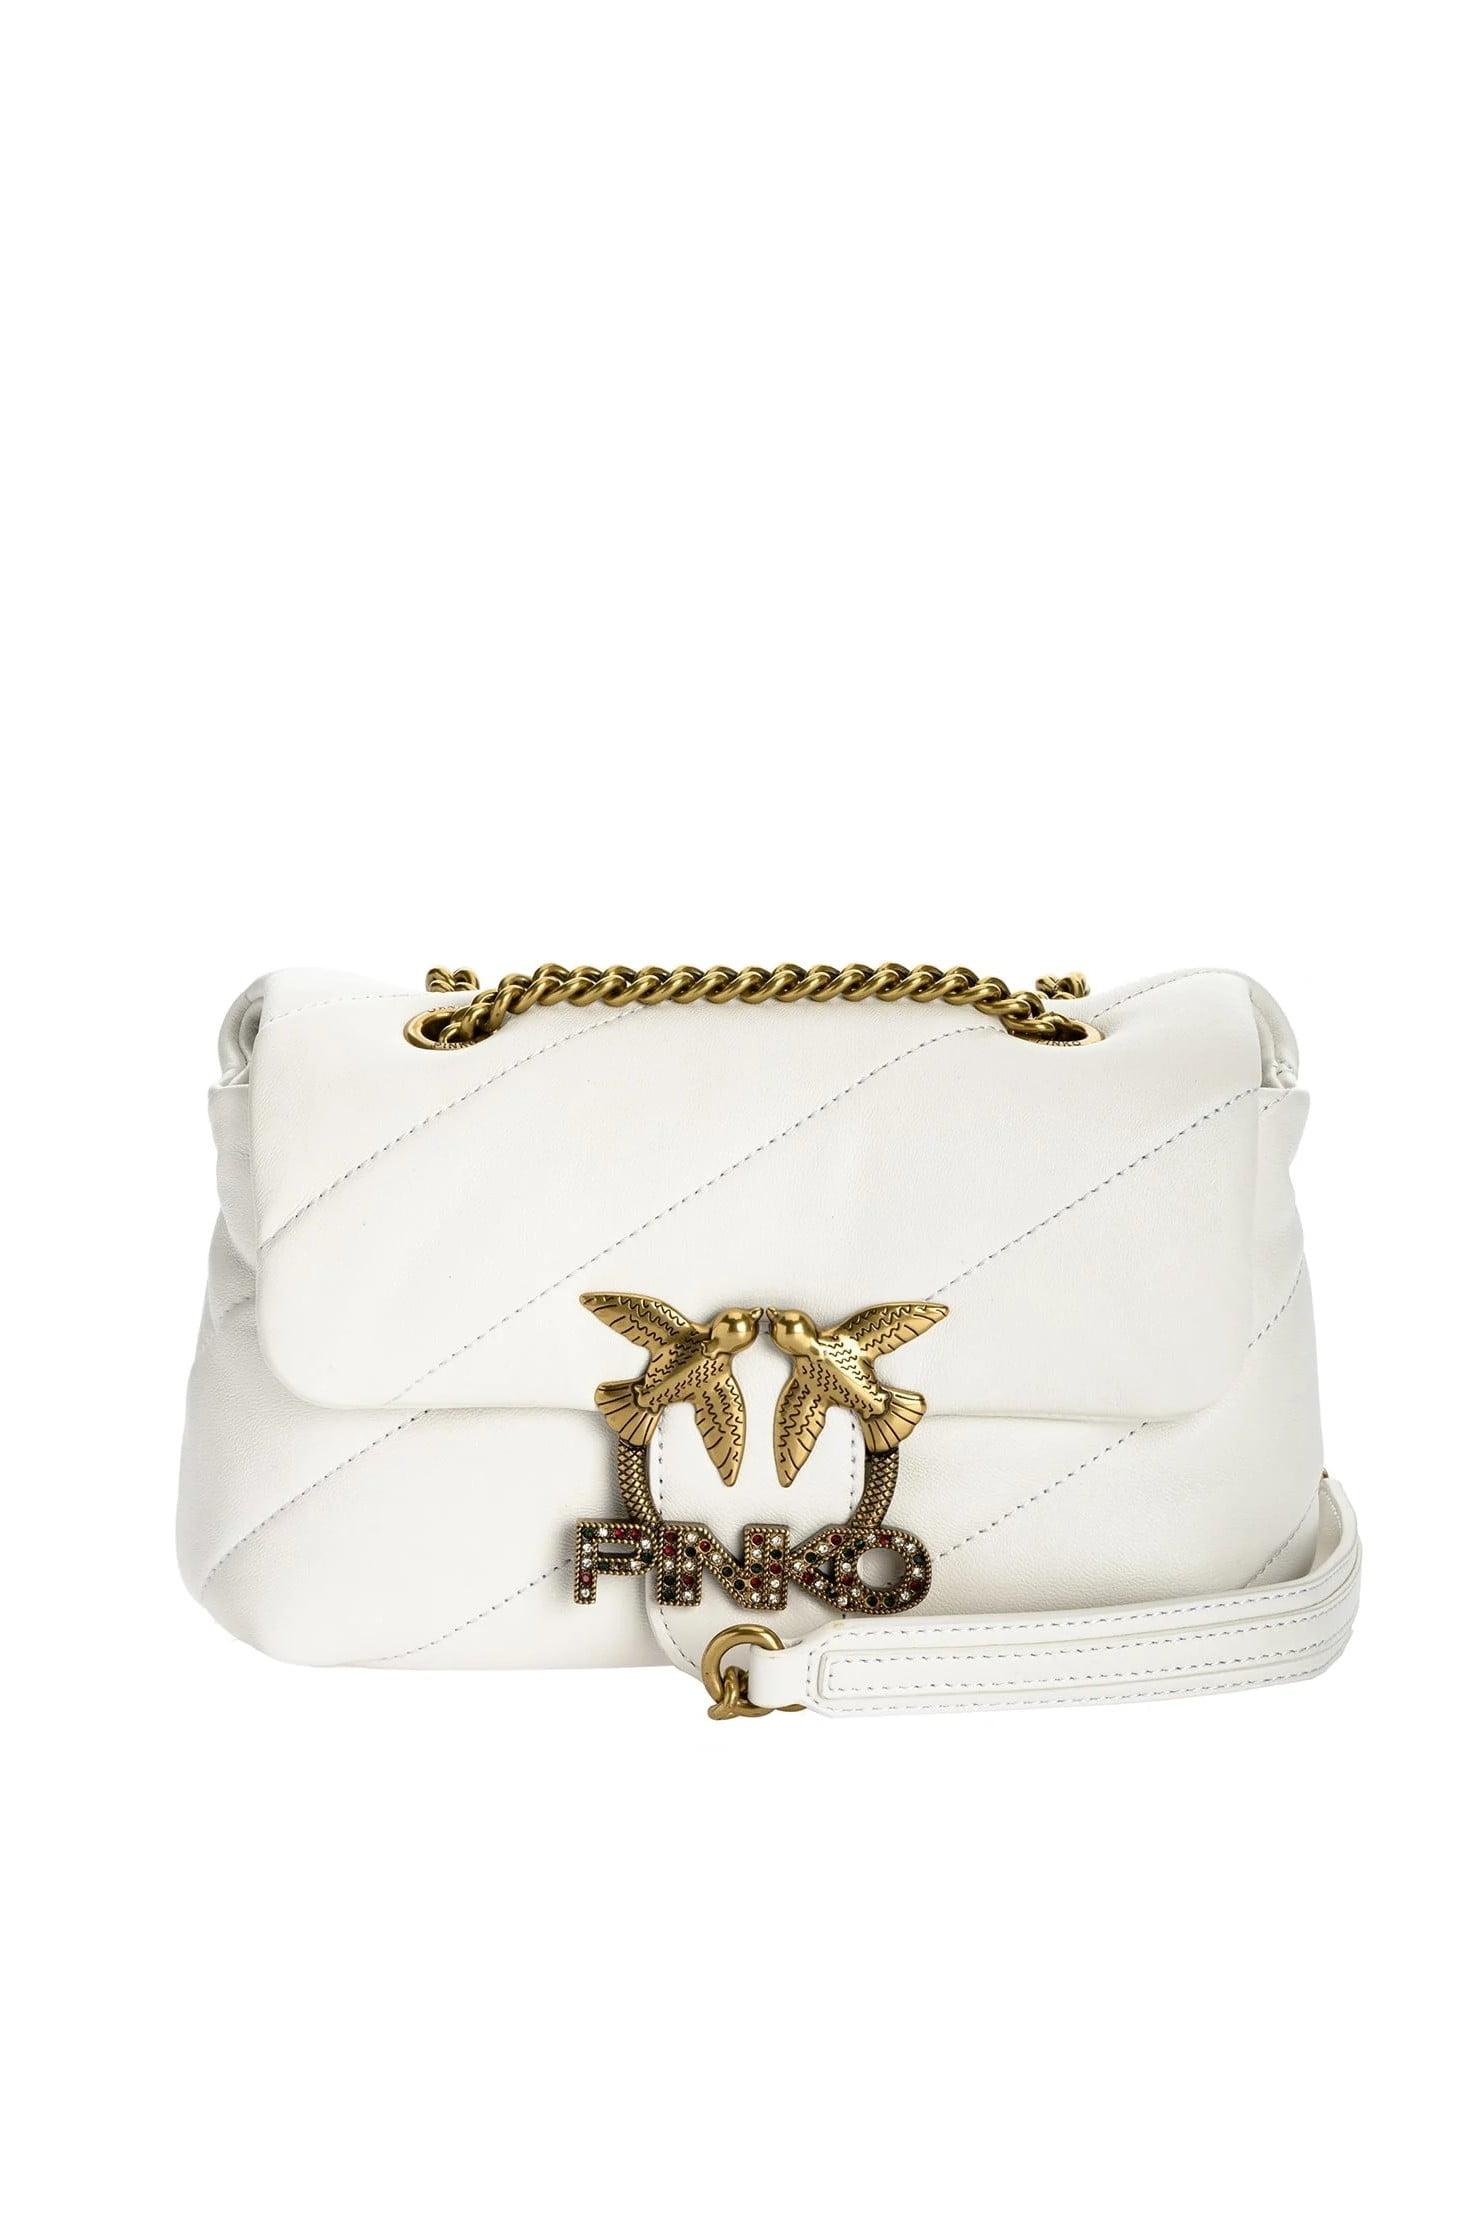 Mini Love Bag Puff Jewel White